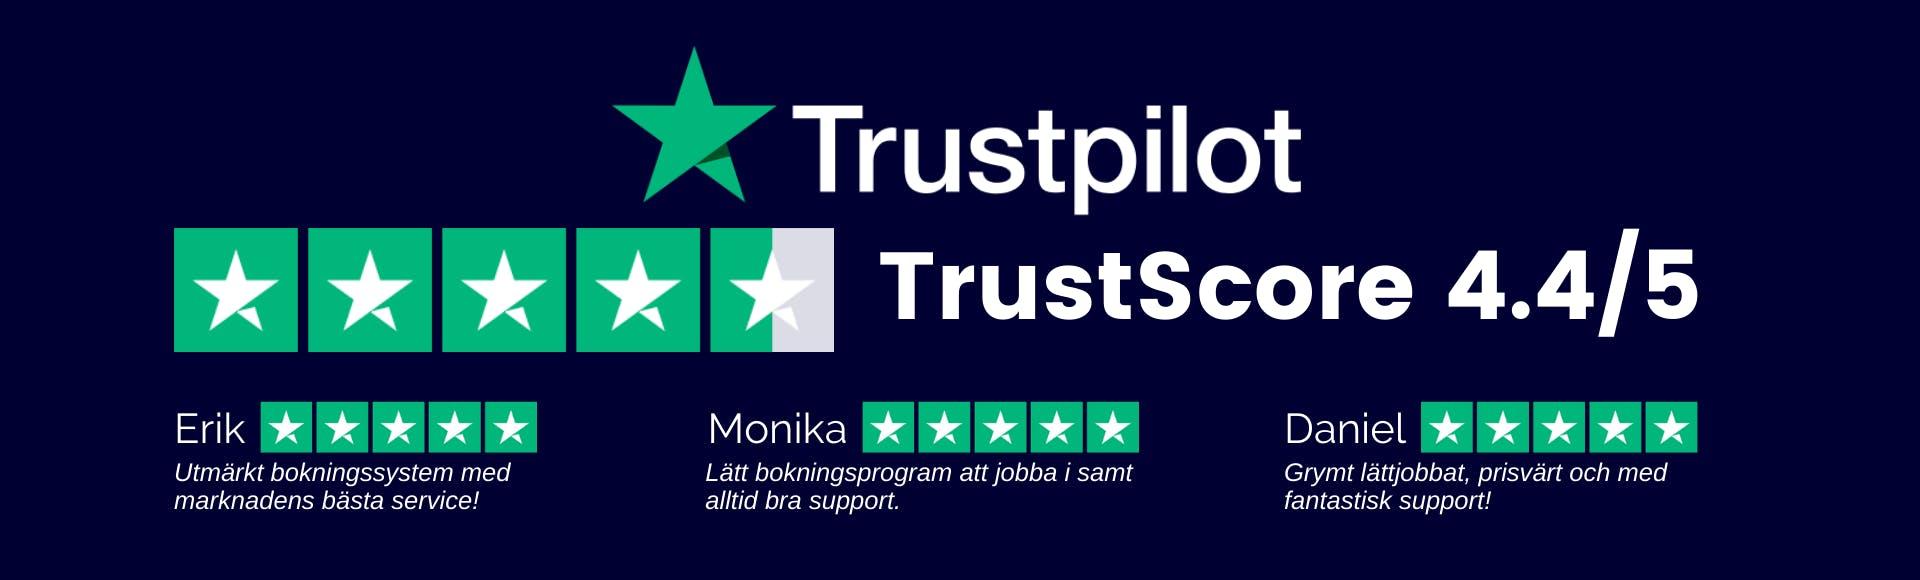 BokaMera Trustpilot omdömen rejta